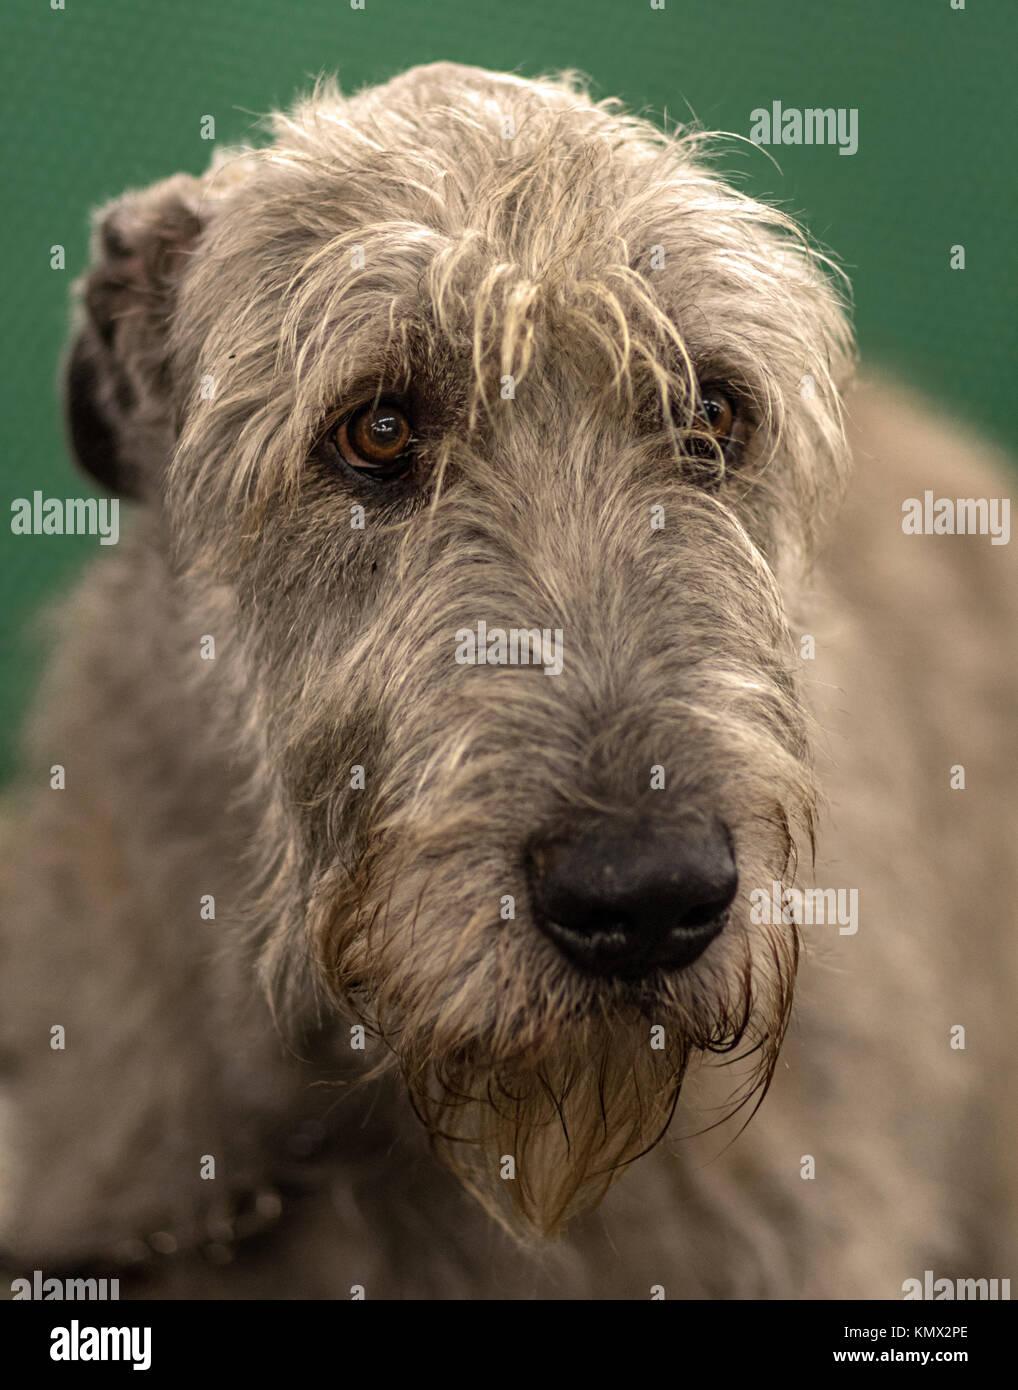 Irish Wolfhound Portrait, Oblique Profile, Green Background, Wirehair Show Dog Trim Stock Photo